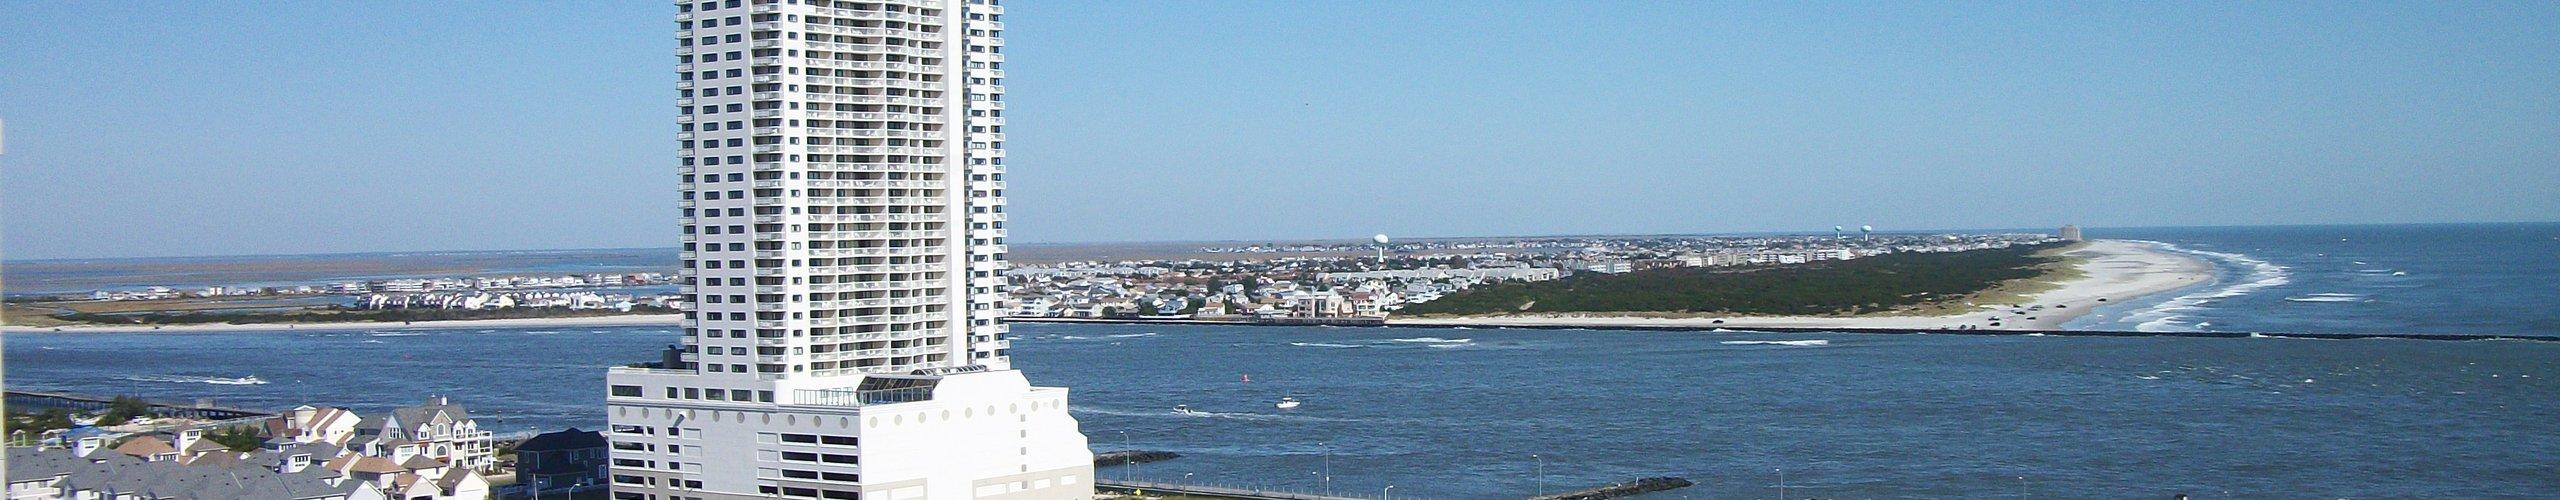 ENDICOTT HOTEL - Reviews (Atlantic City, NJ) - TripAdvisor